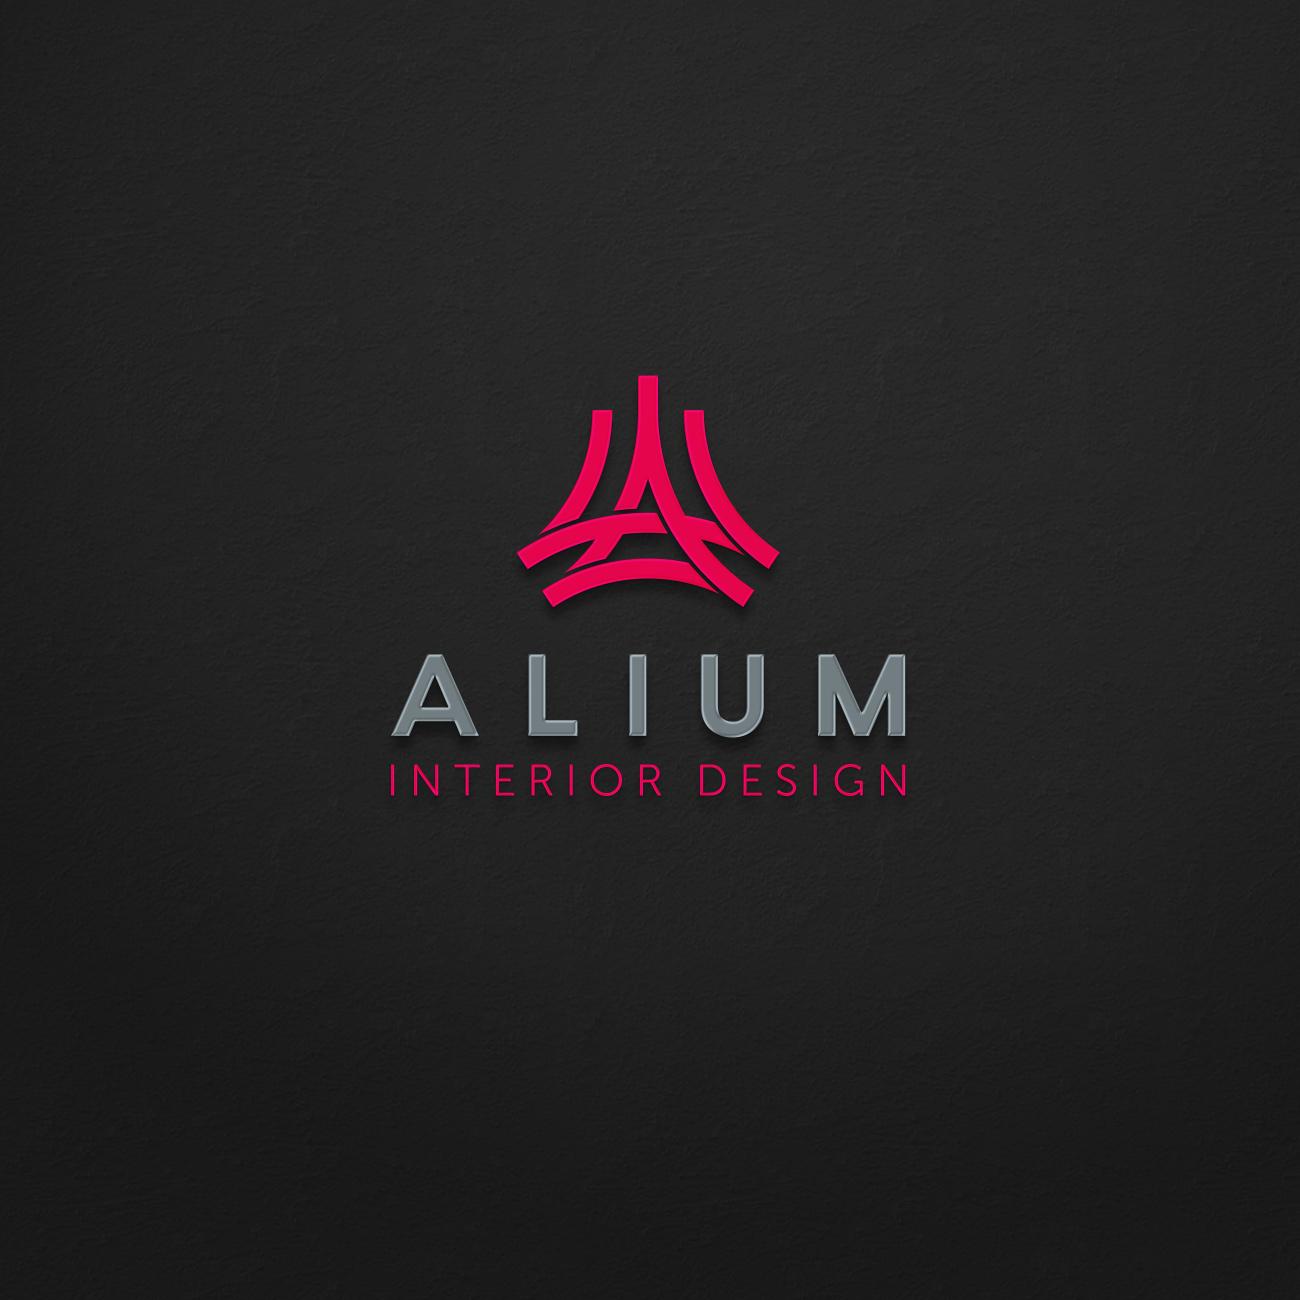 Логотип для дизайн студии фото f_91959e53f5f4a758.jpg